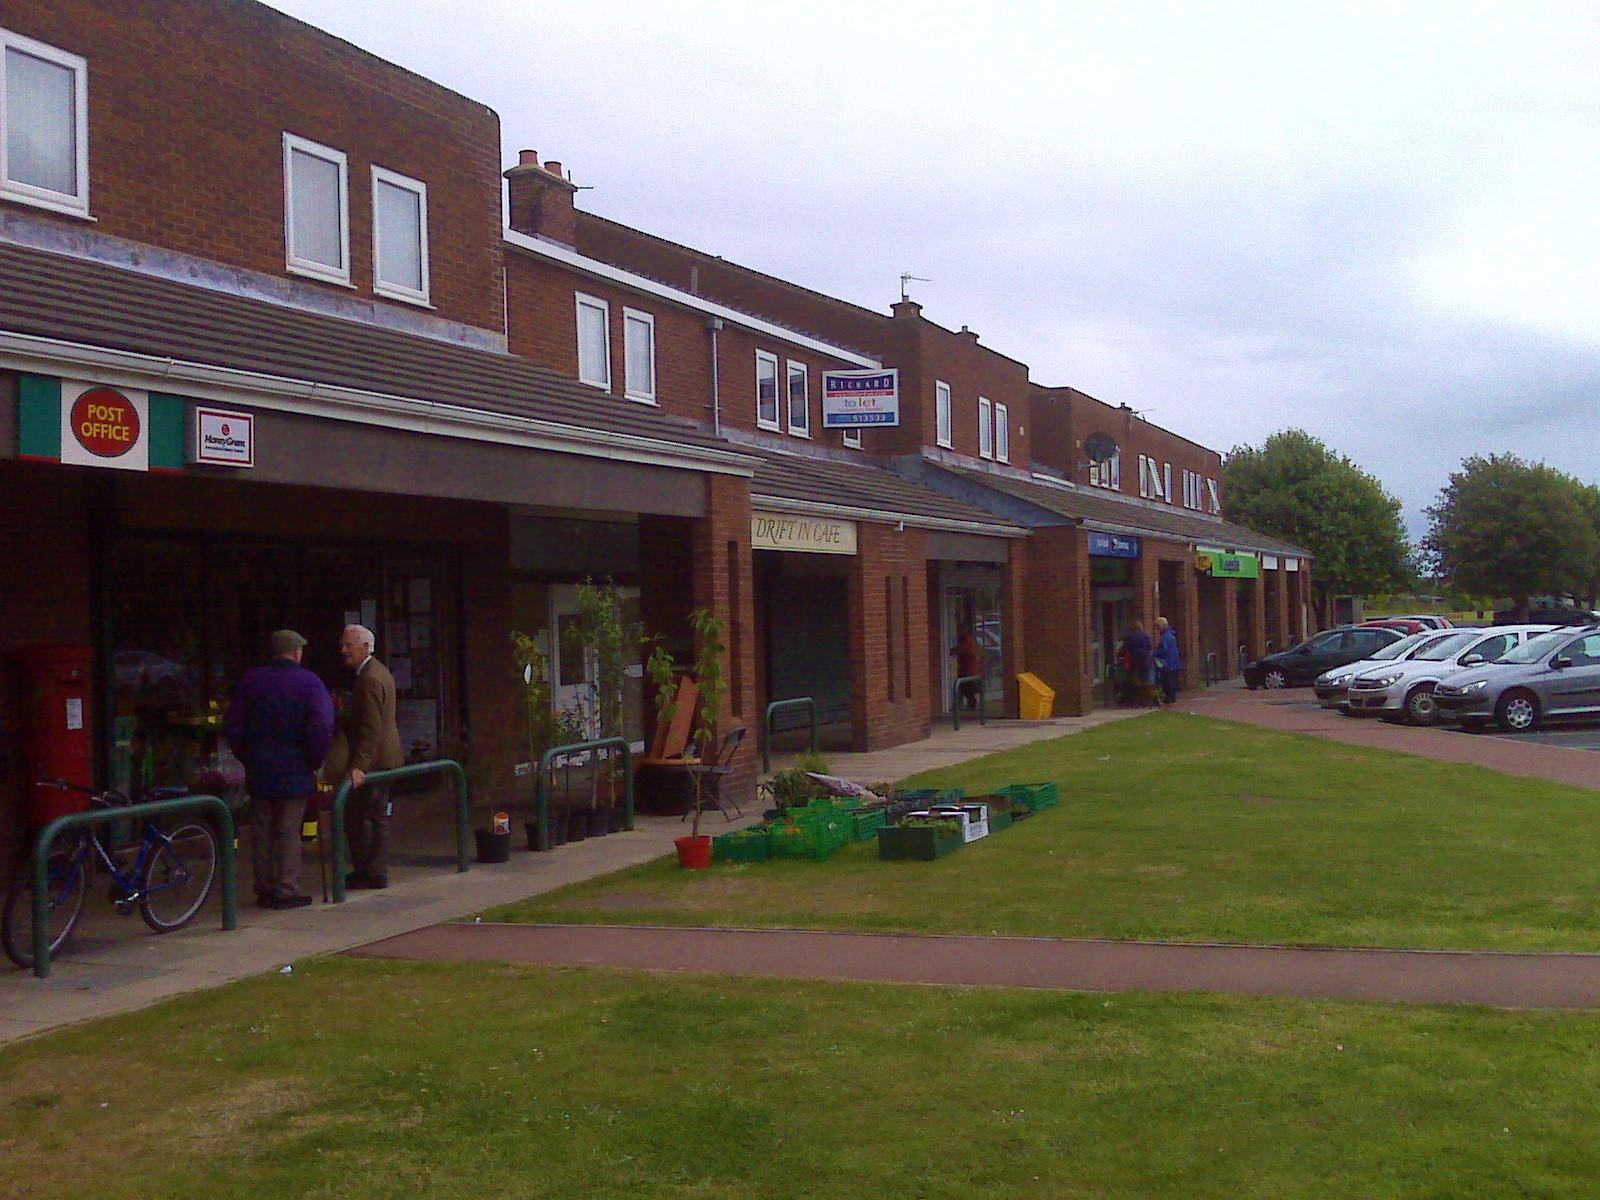 The Precinct, Hadston, Northumberland, NE65 9YF